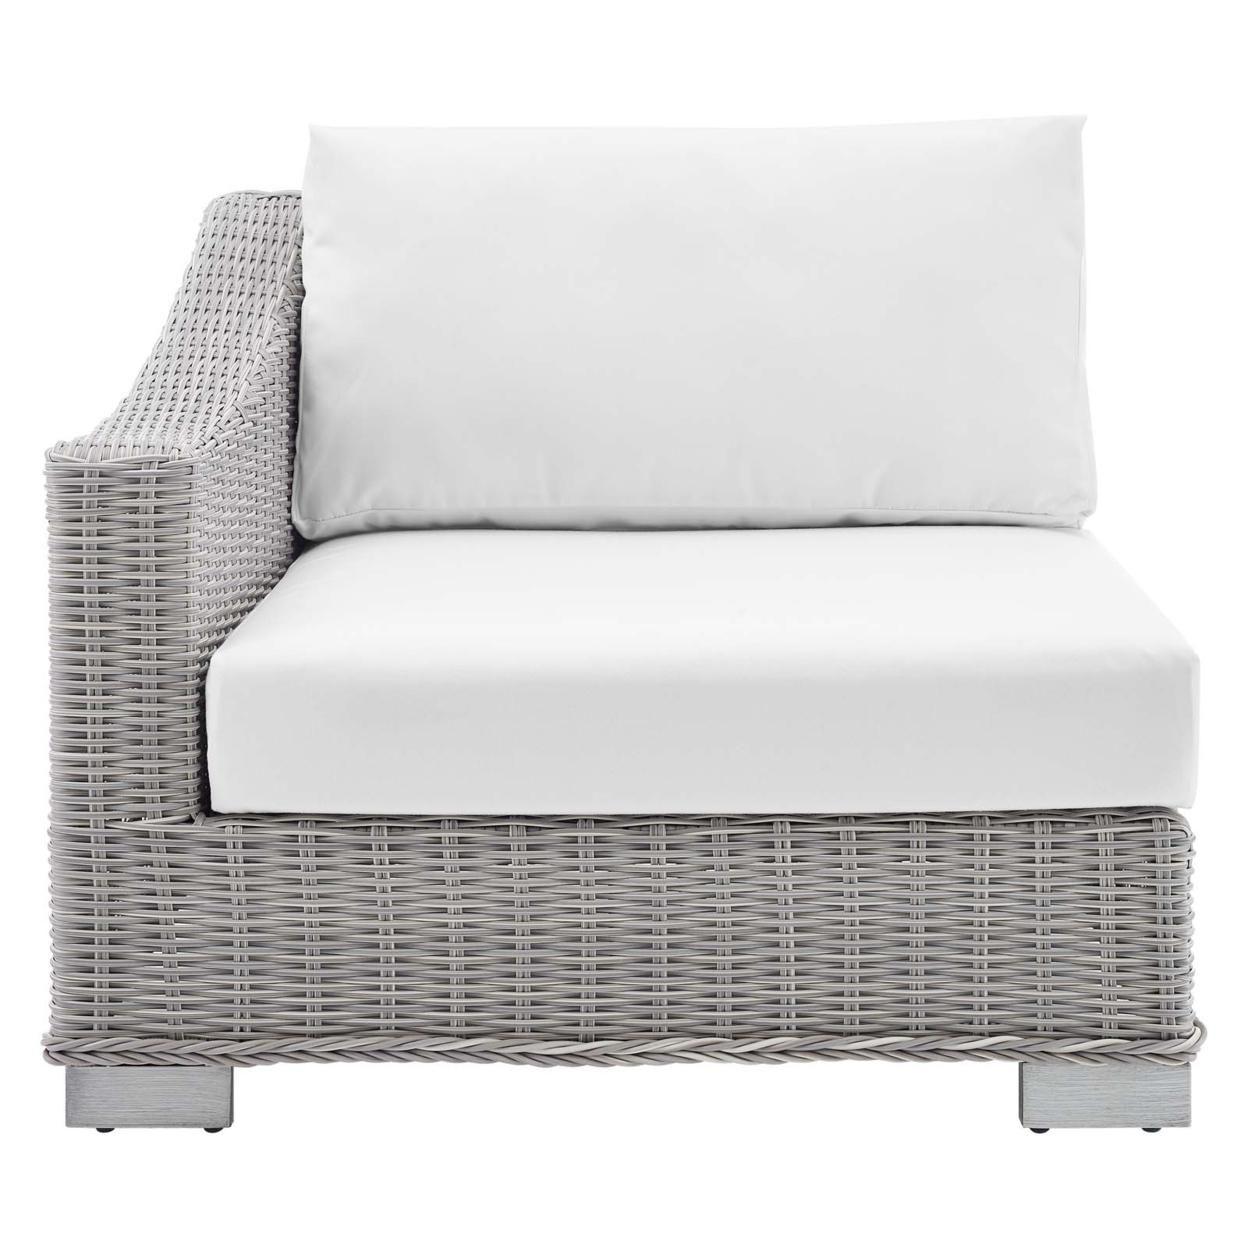 Conway Sunbrella� Outdoor Patio Wicker Rattan Left-Arm Chair, Light Gray White